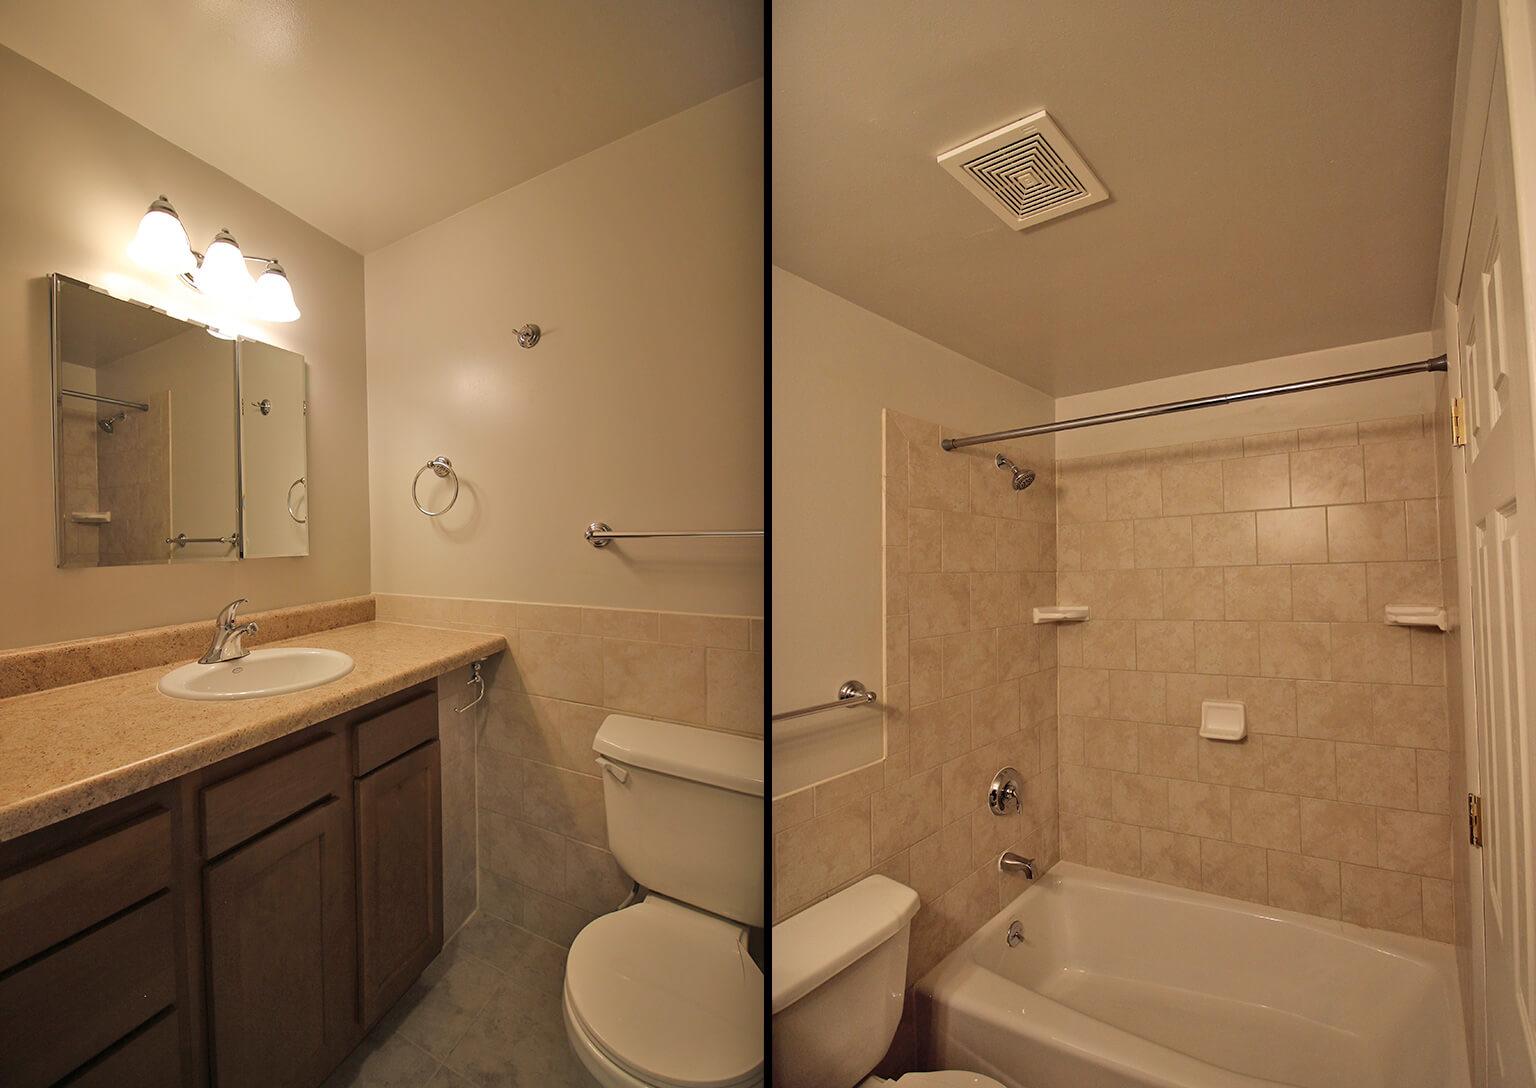 Valley View Apartments - Bathroom